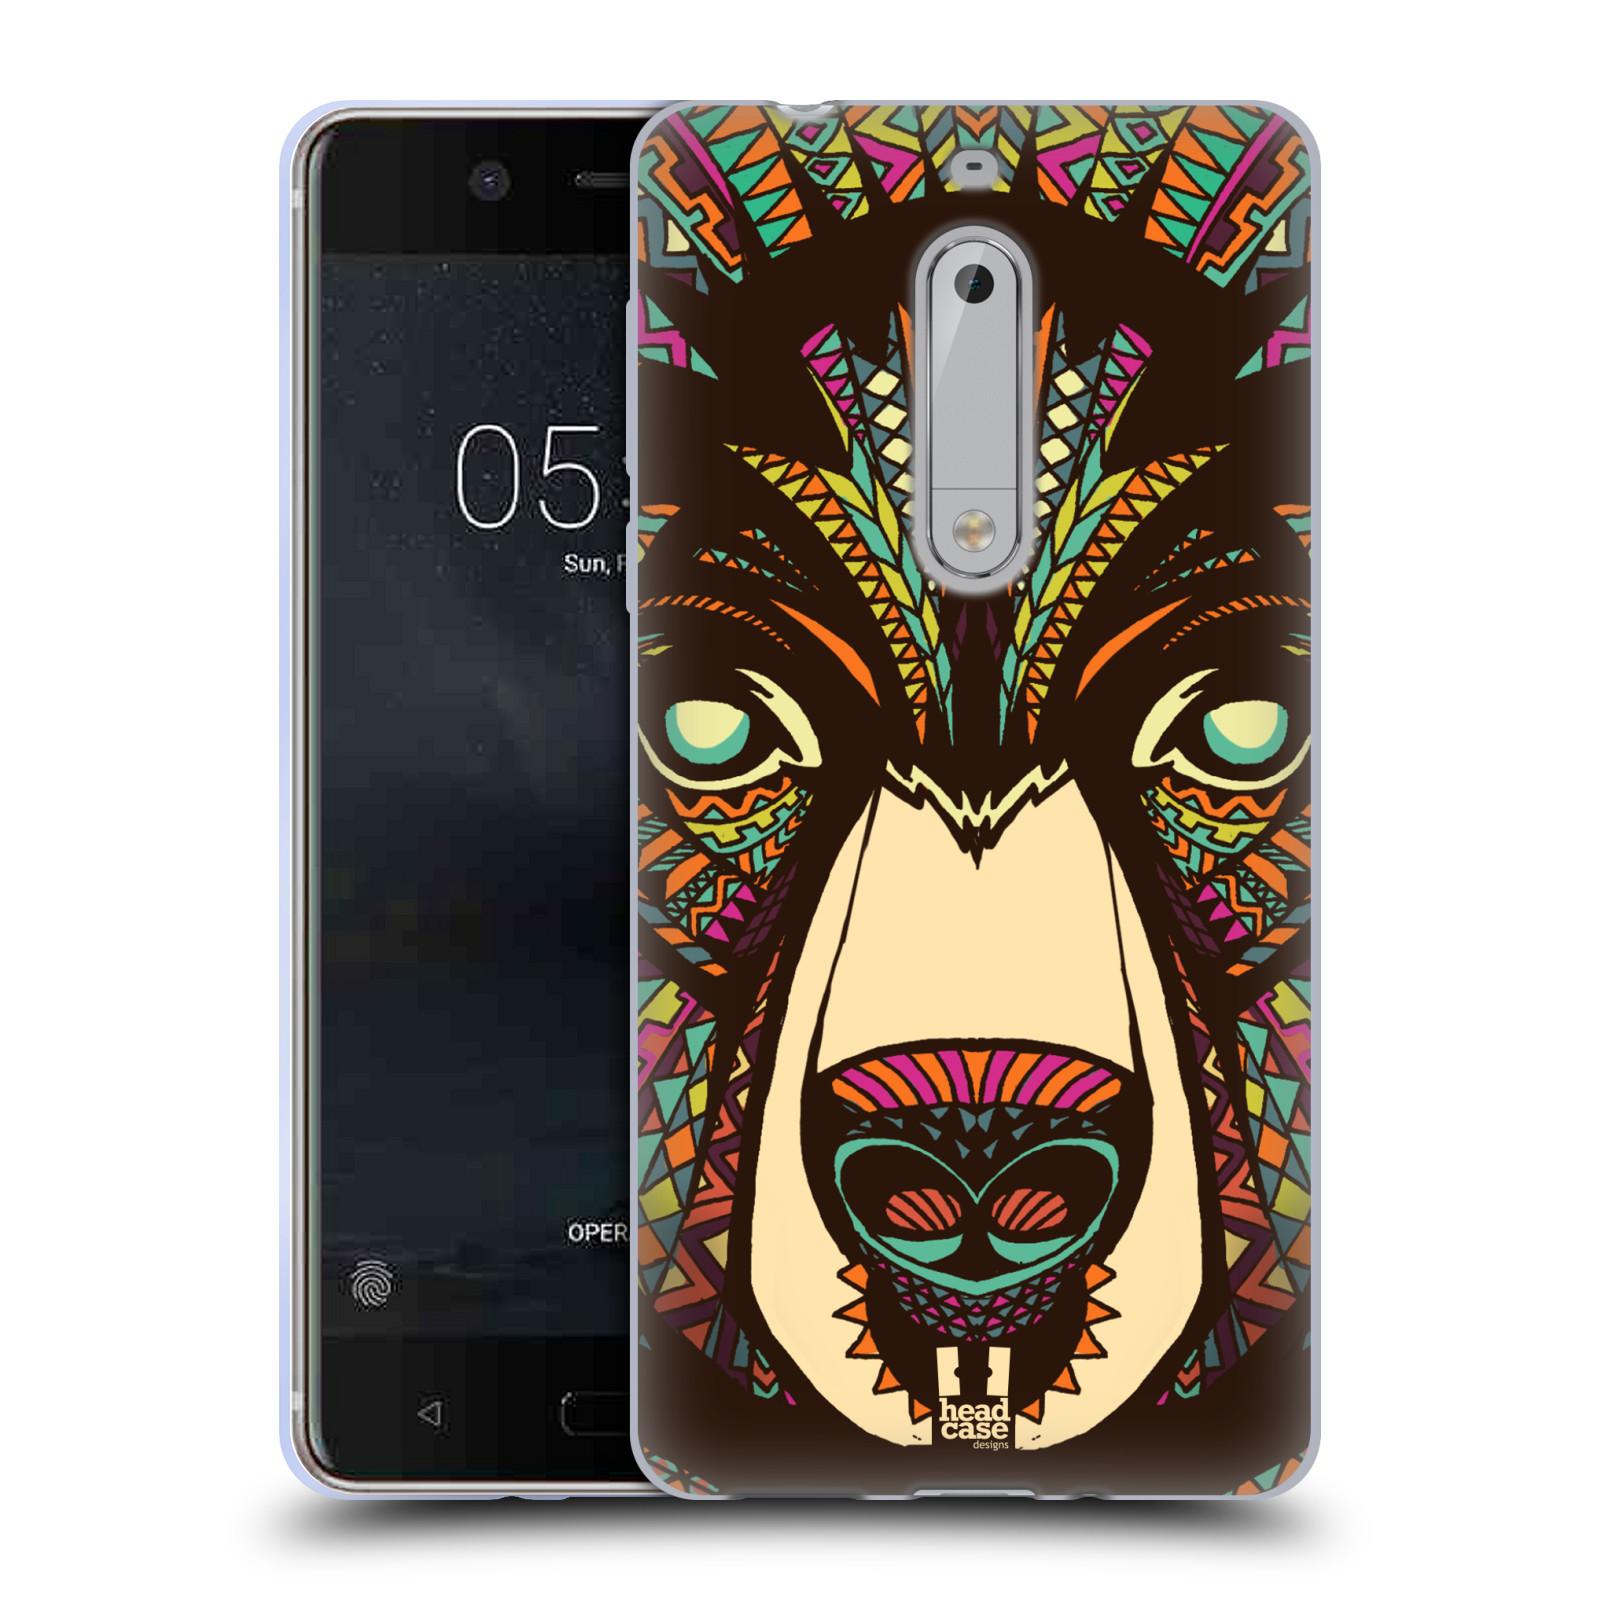 Silikonové pouzdro na mobil Nokia 5 Head Case - AZTEC MEDVĚD